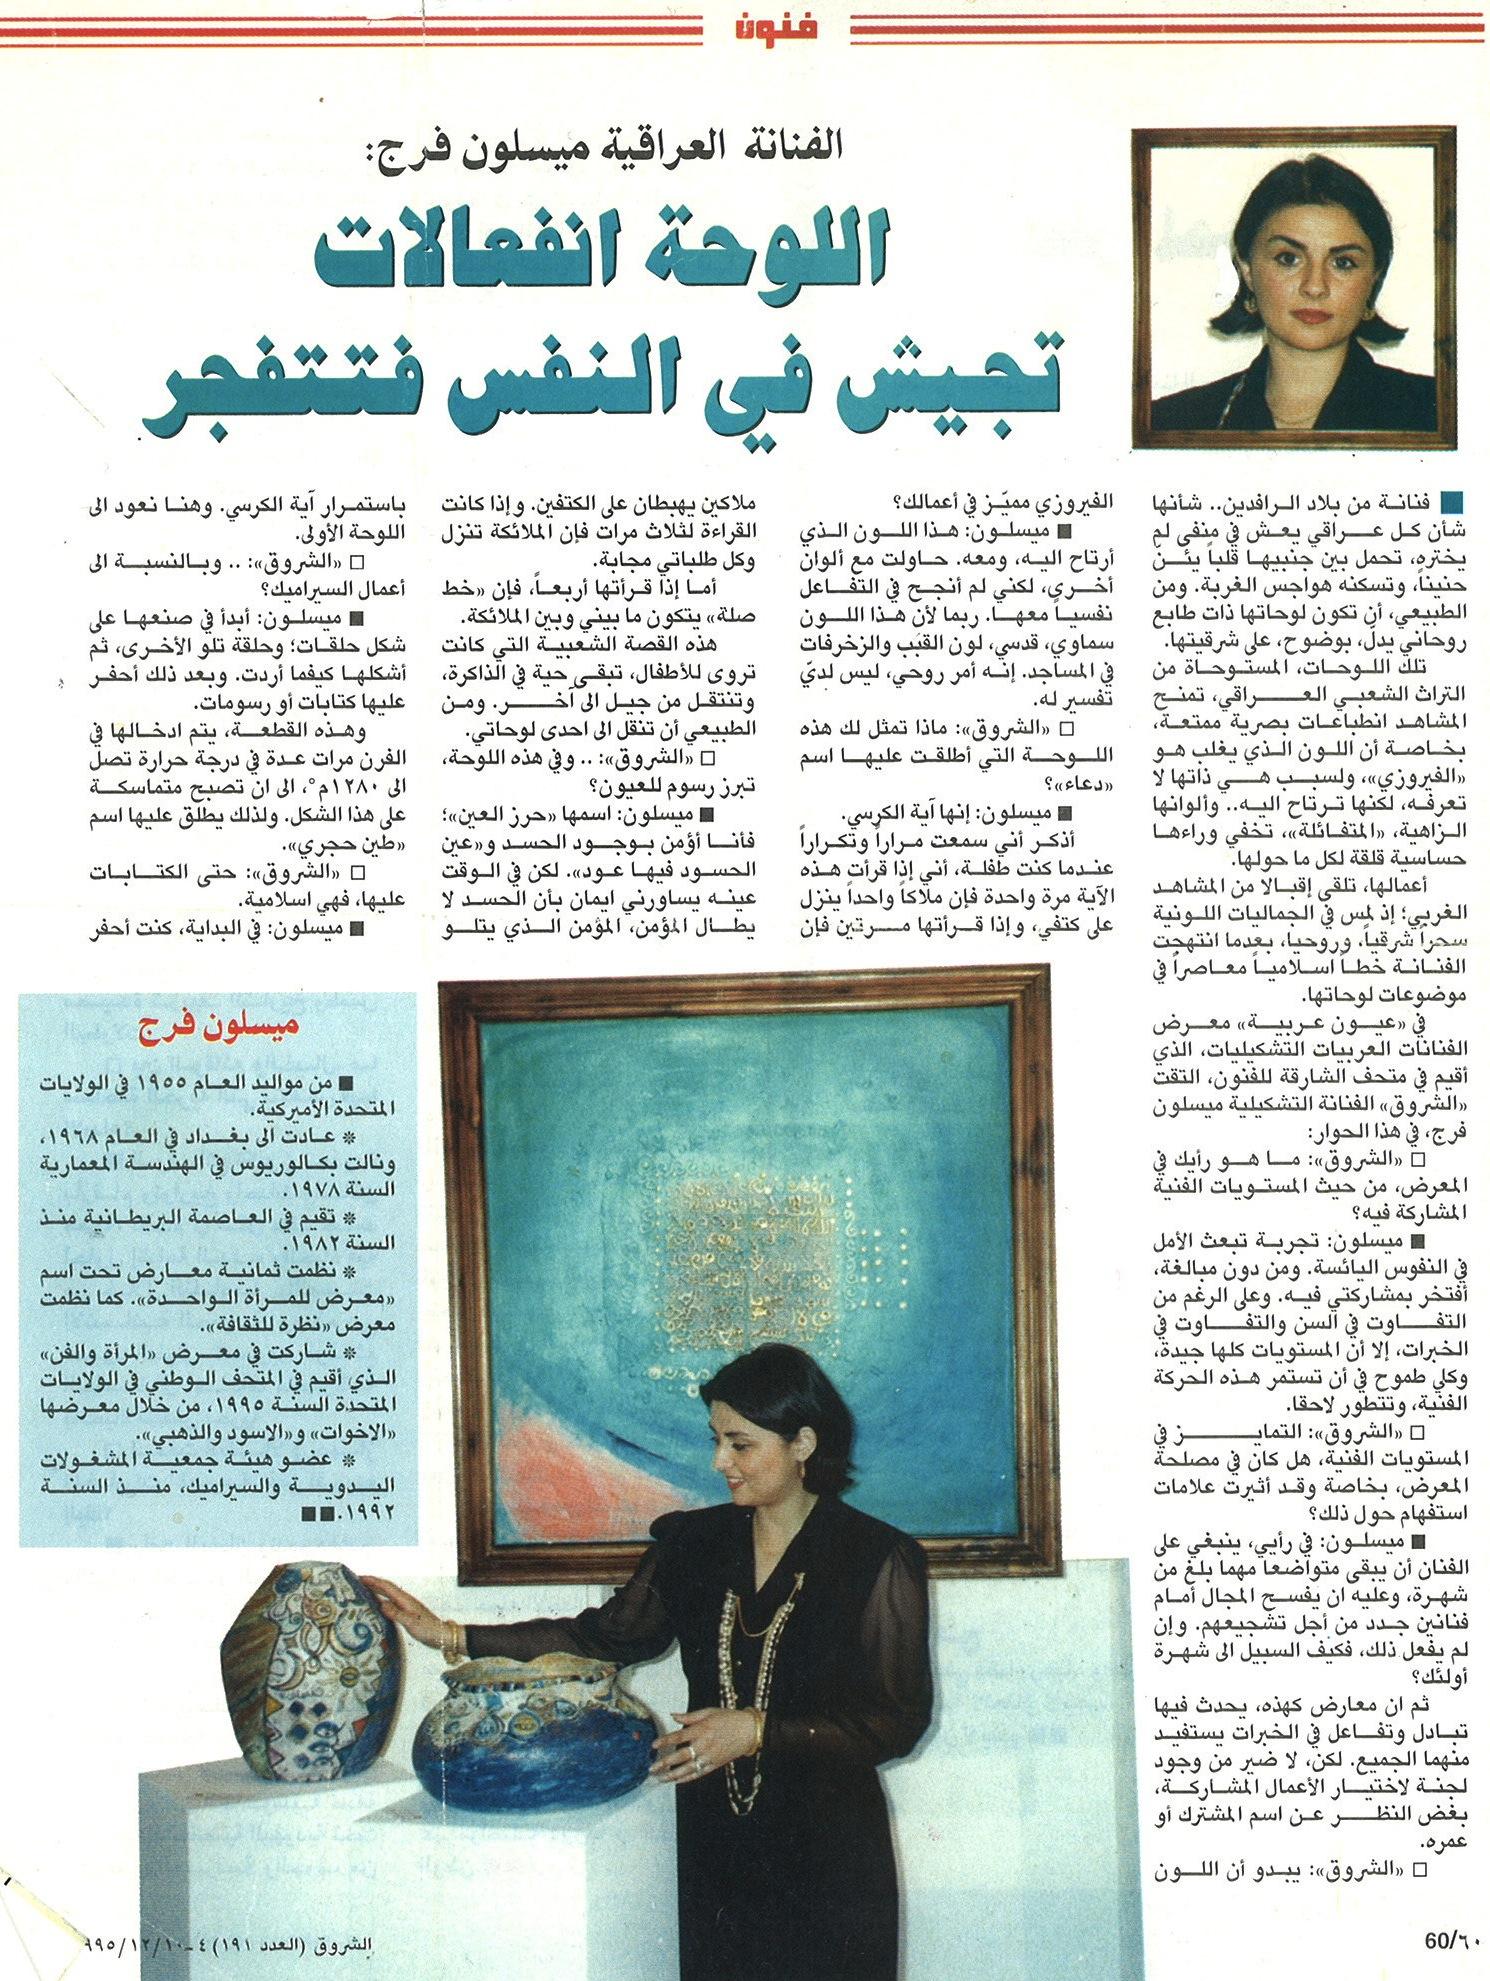 Uyoun Arabiya  Arabian Eyes  Exhibition of Arab women artists at Beit al-Sirkal Sharjah UAE 1995